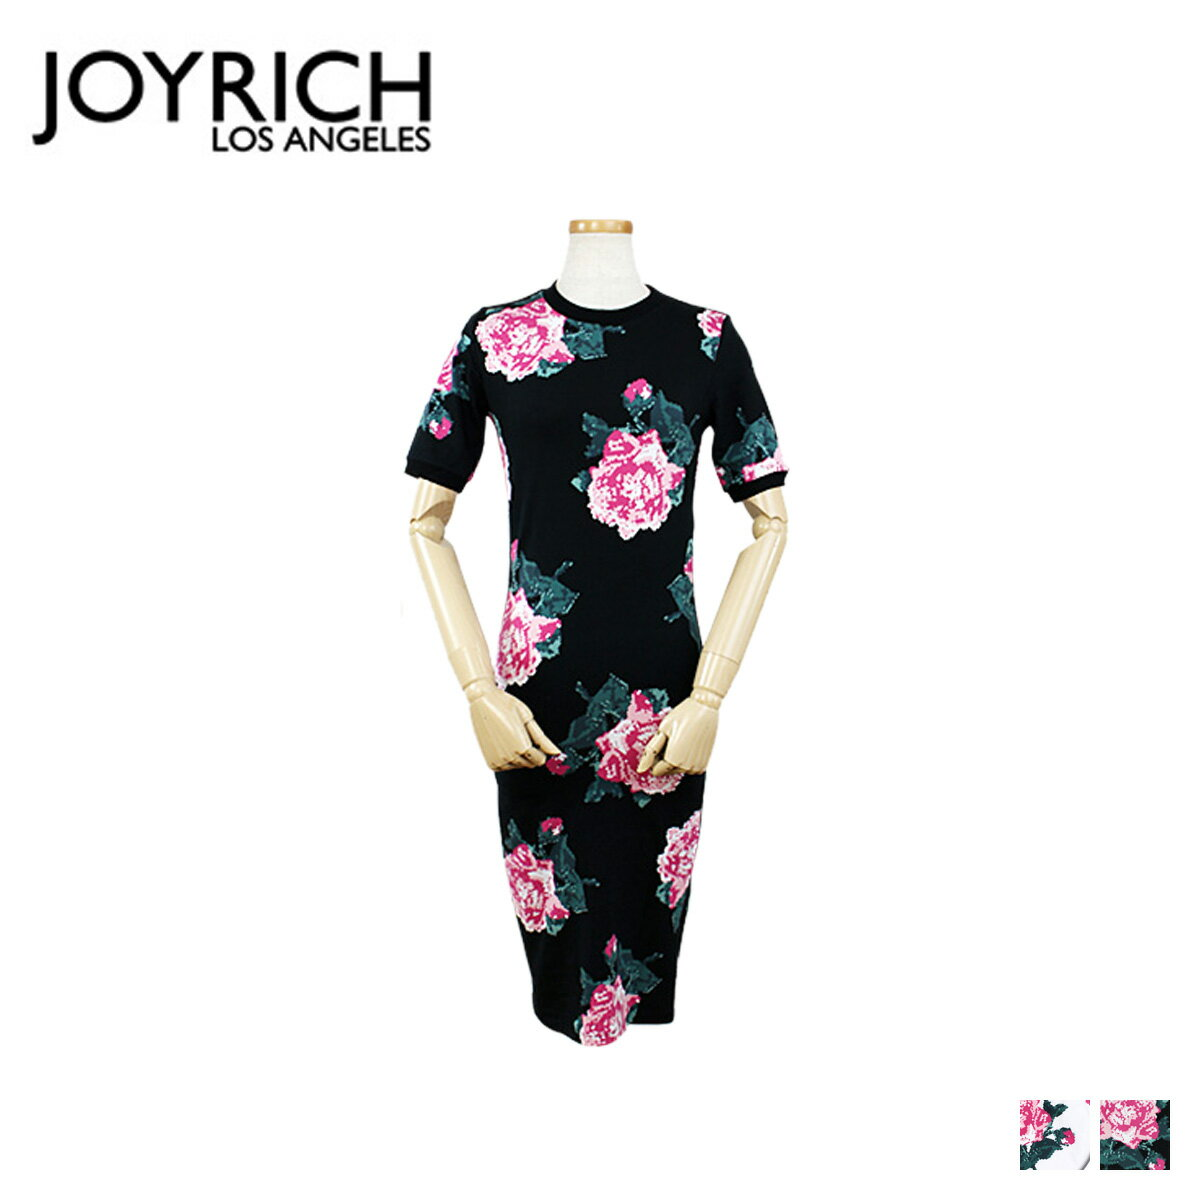 JOYRICH ジョイリッチ ワンピース タイトワンピース 半袖 ドレス 2カラー 8BIT FLORAL BODYCON DRESS レディース